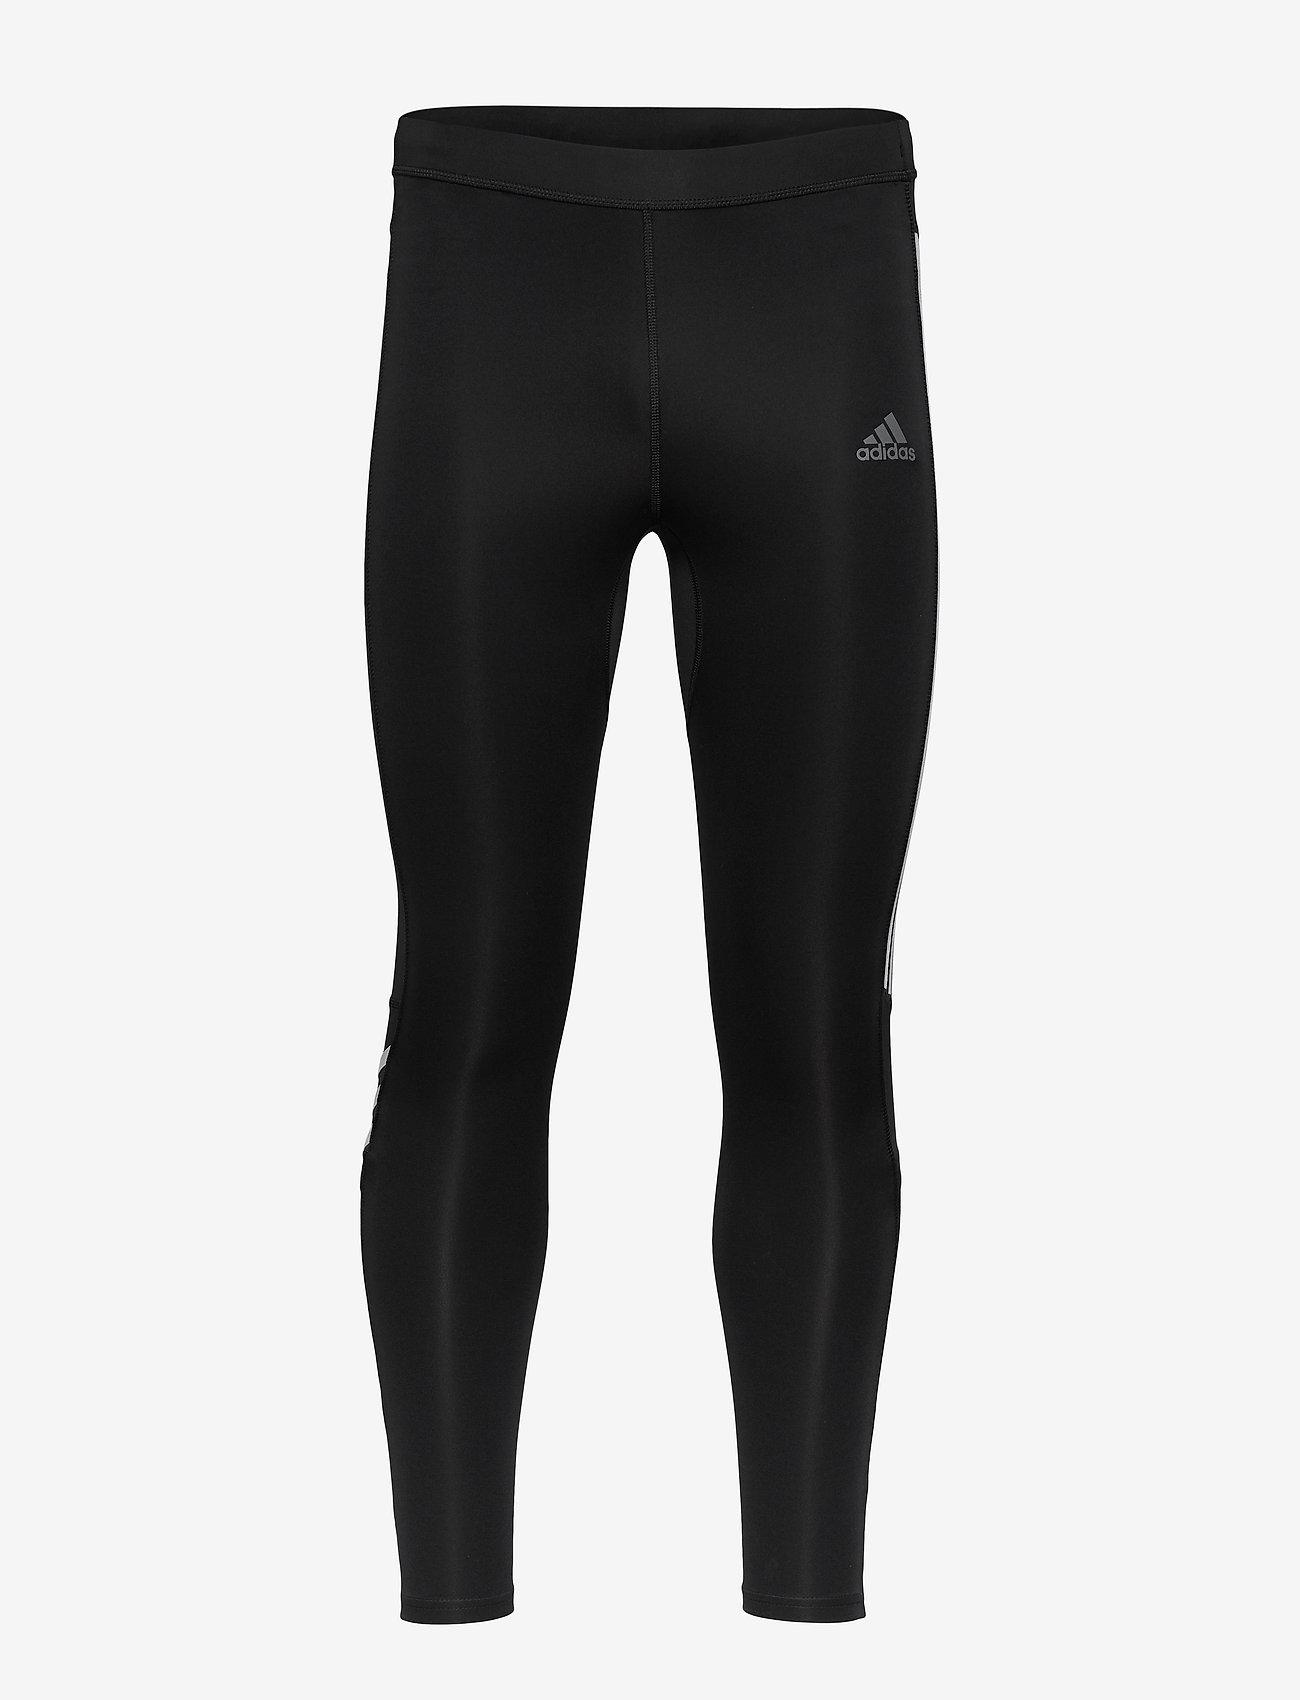 adidas Performance - Run It 3-Stripes Tights - løbe- og træningstights - black/white - 1